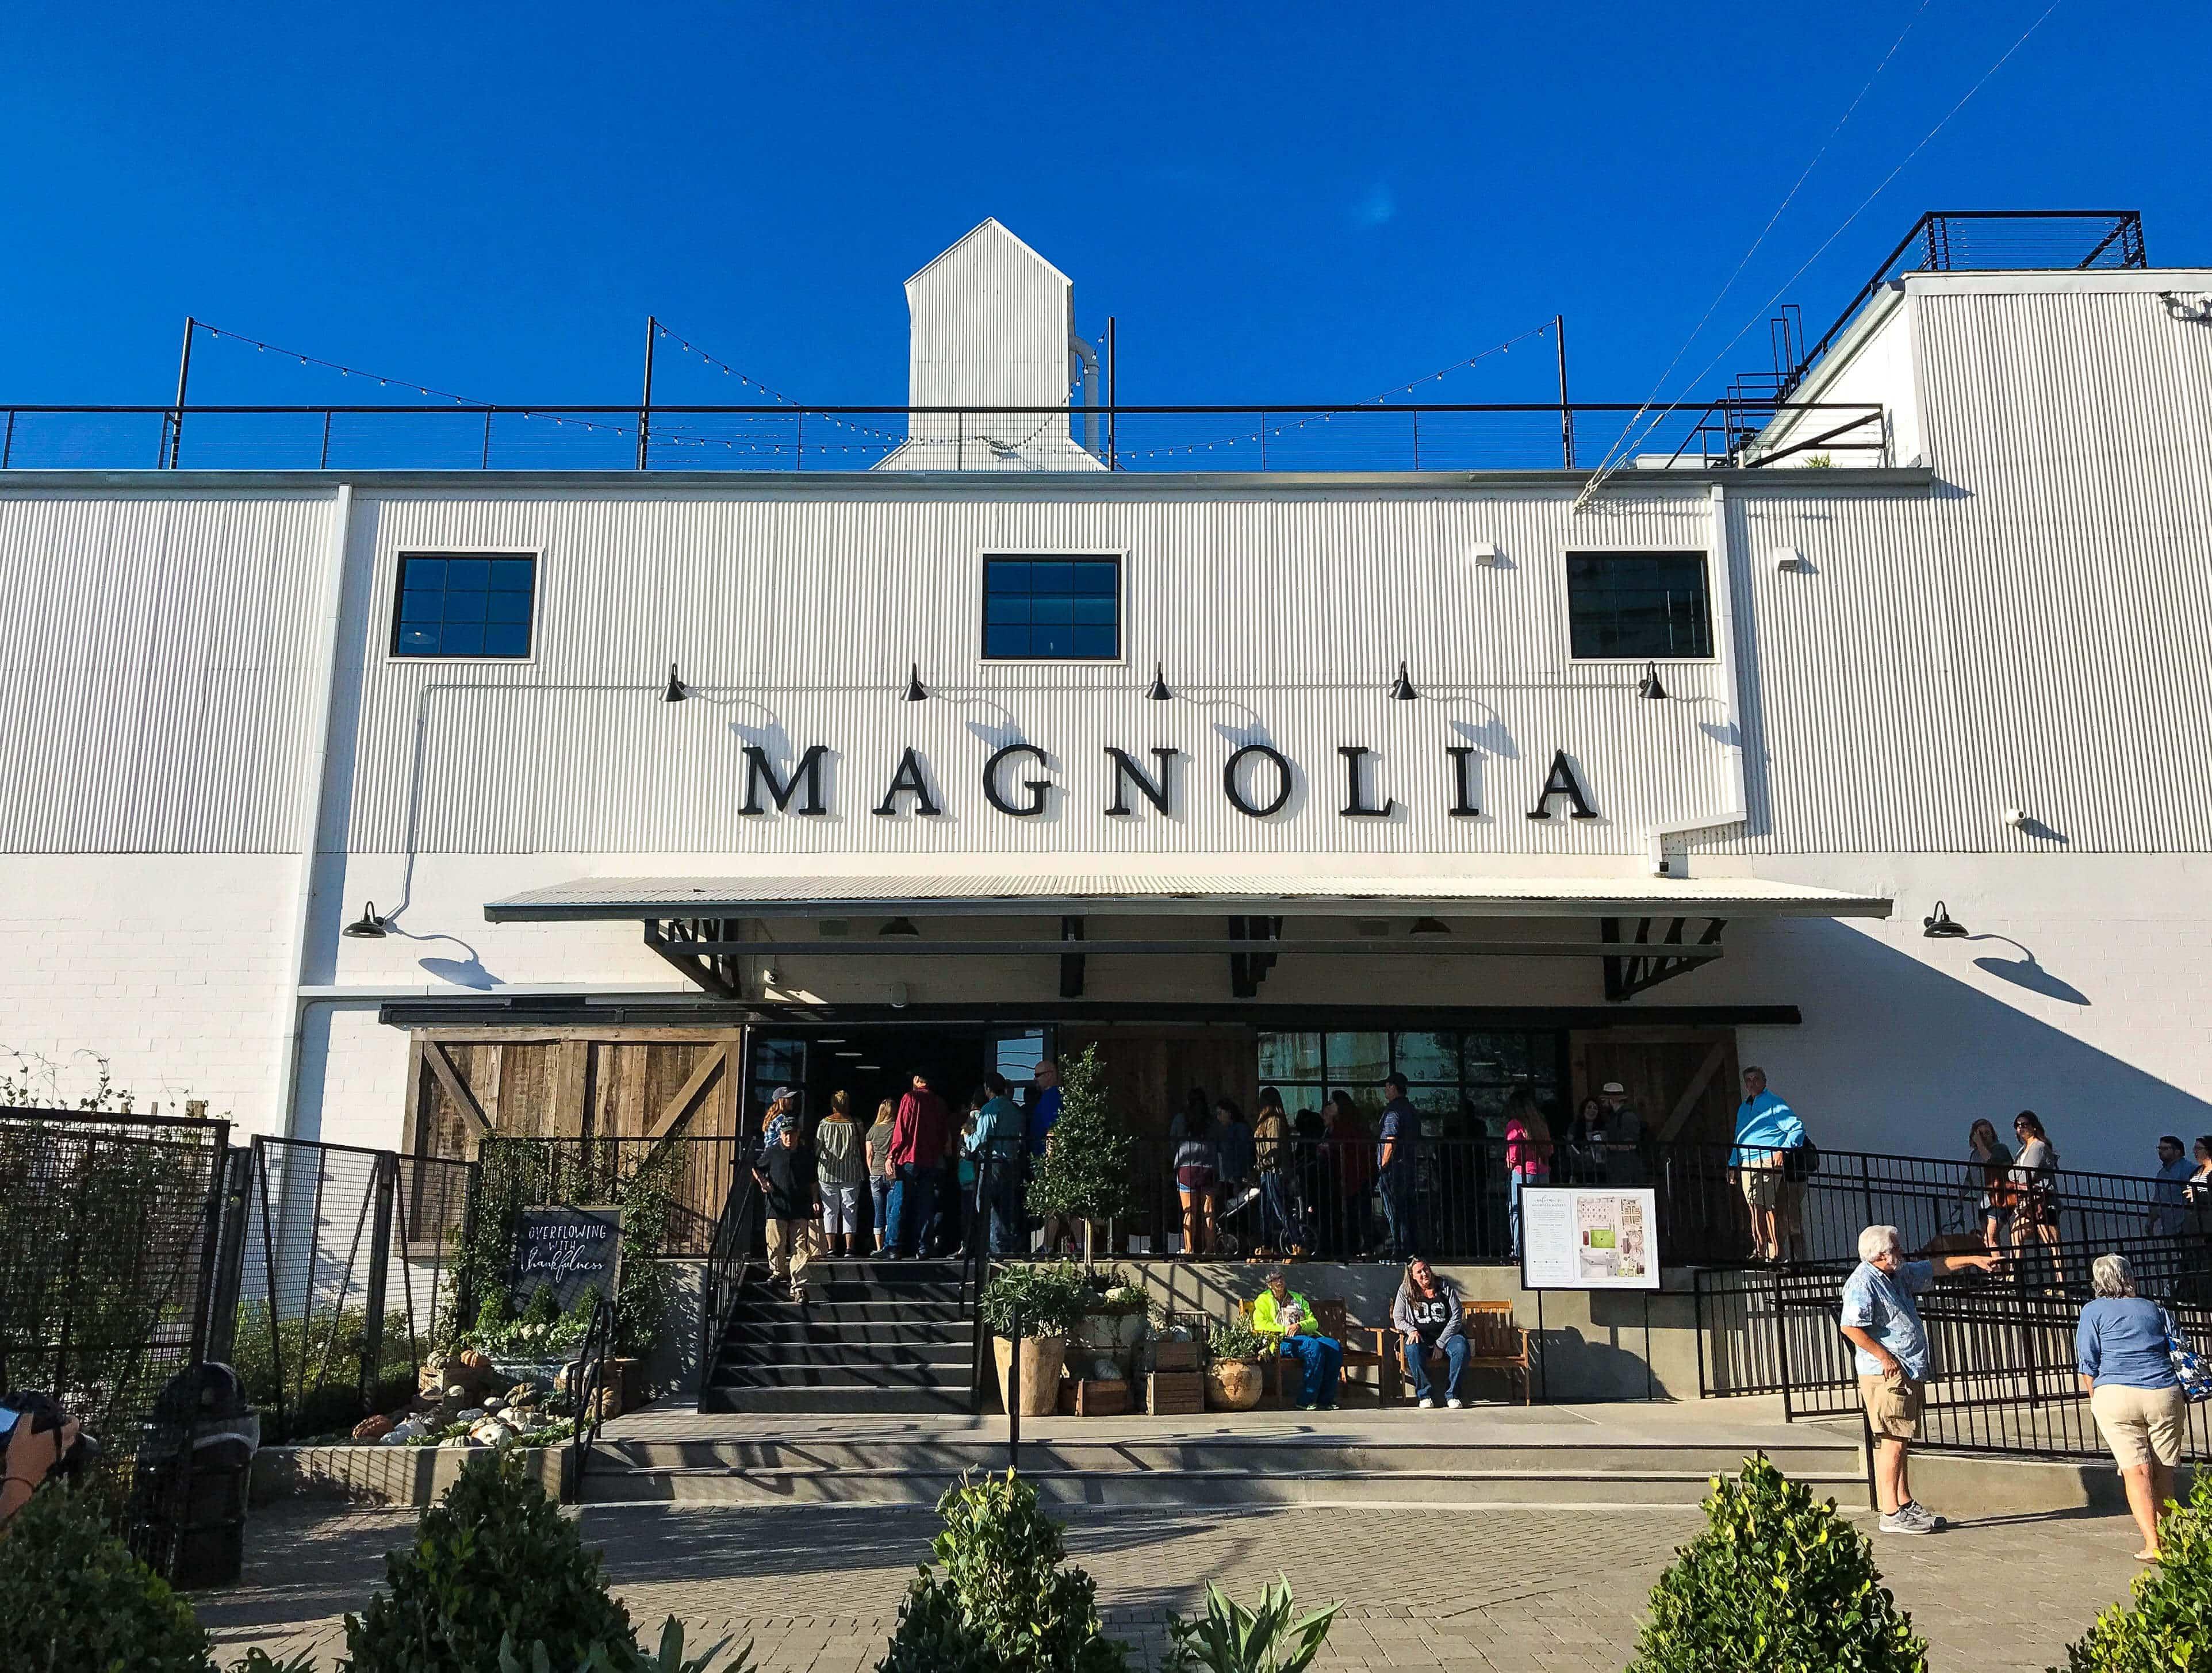 Magnolia Market October 2016